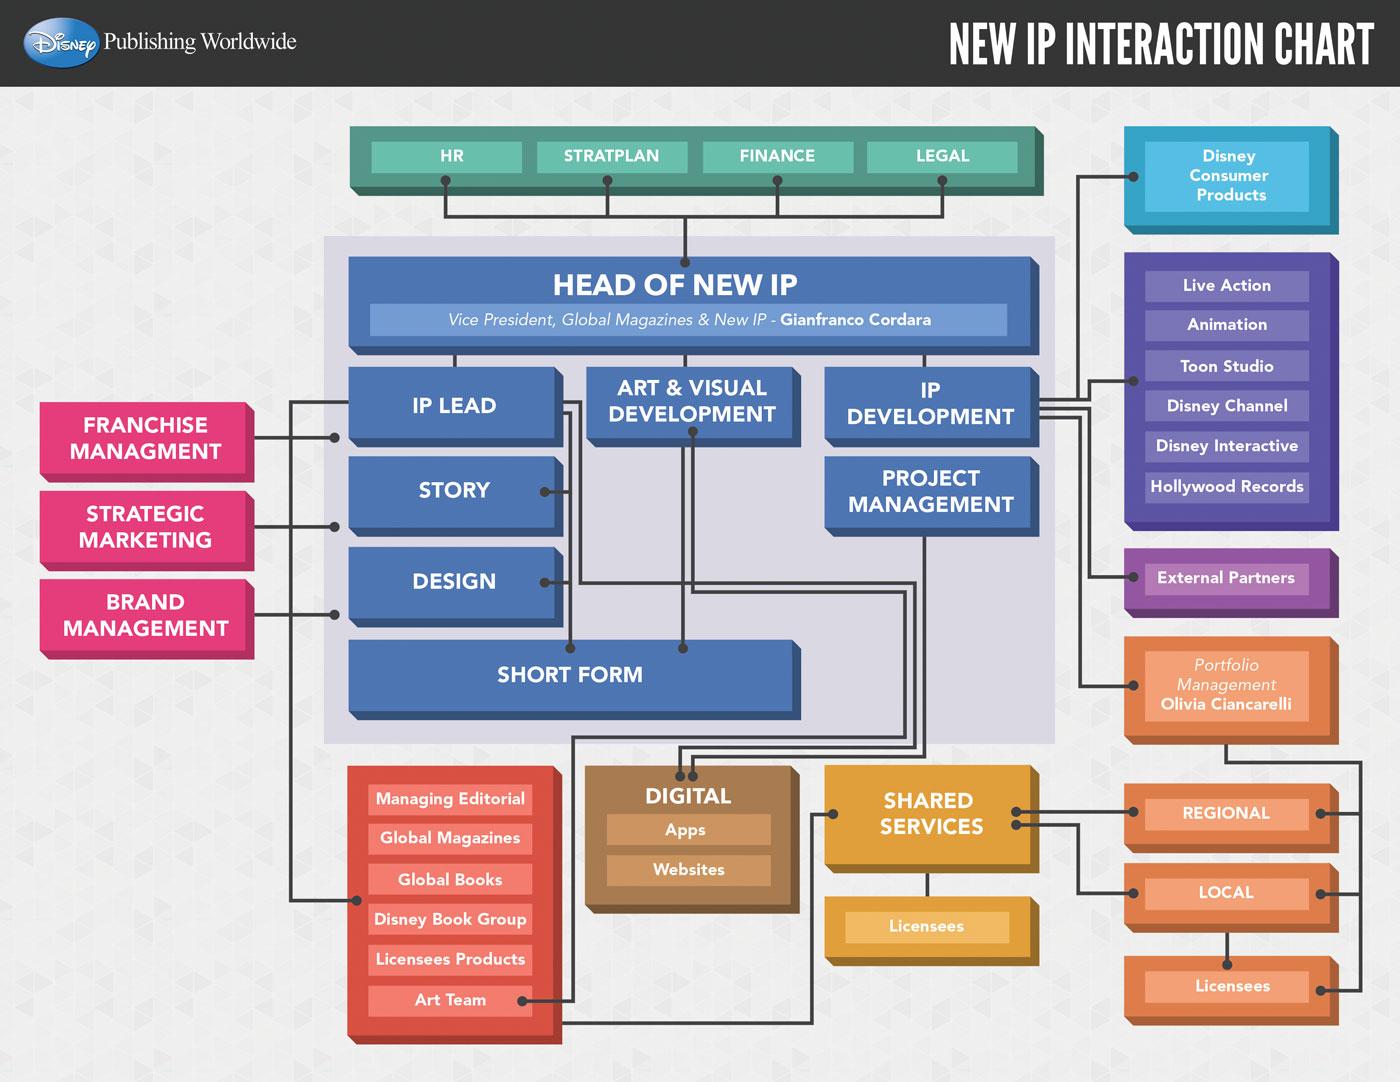 NEWIP_INTERACTION_CHART_V1.jpg